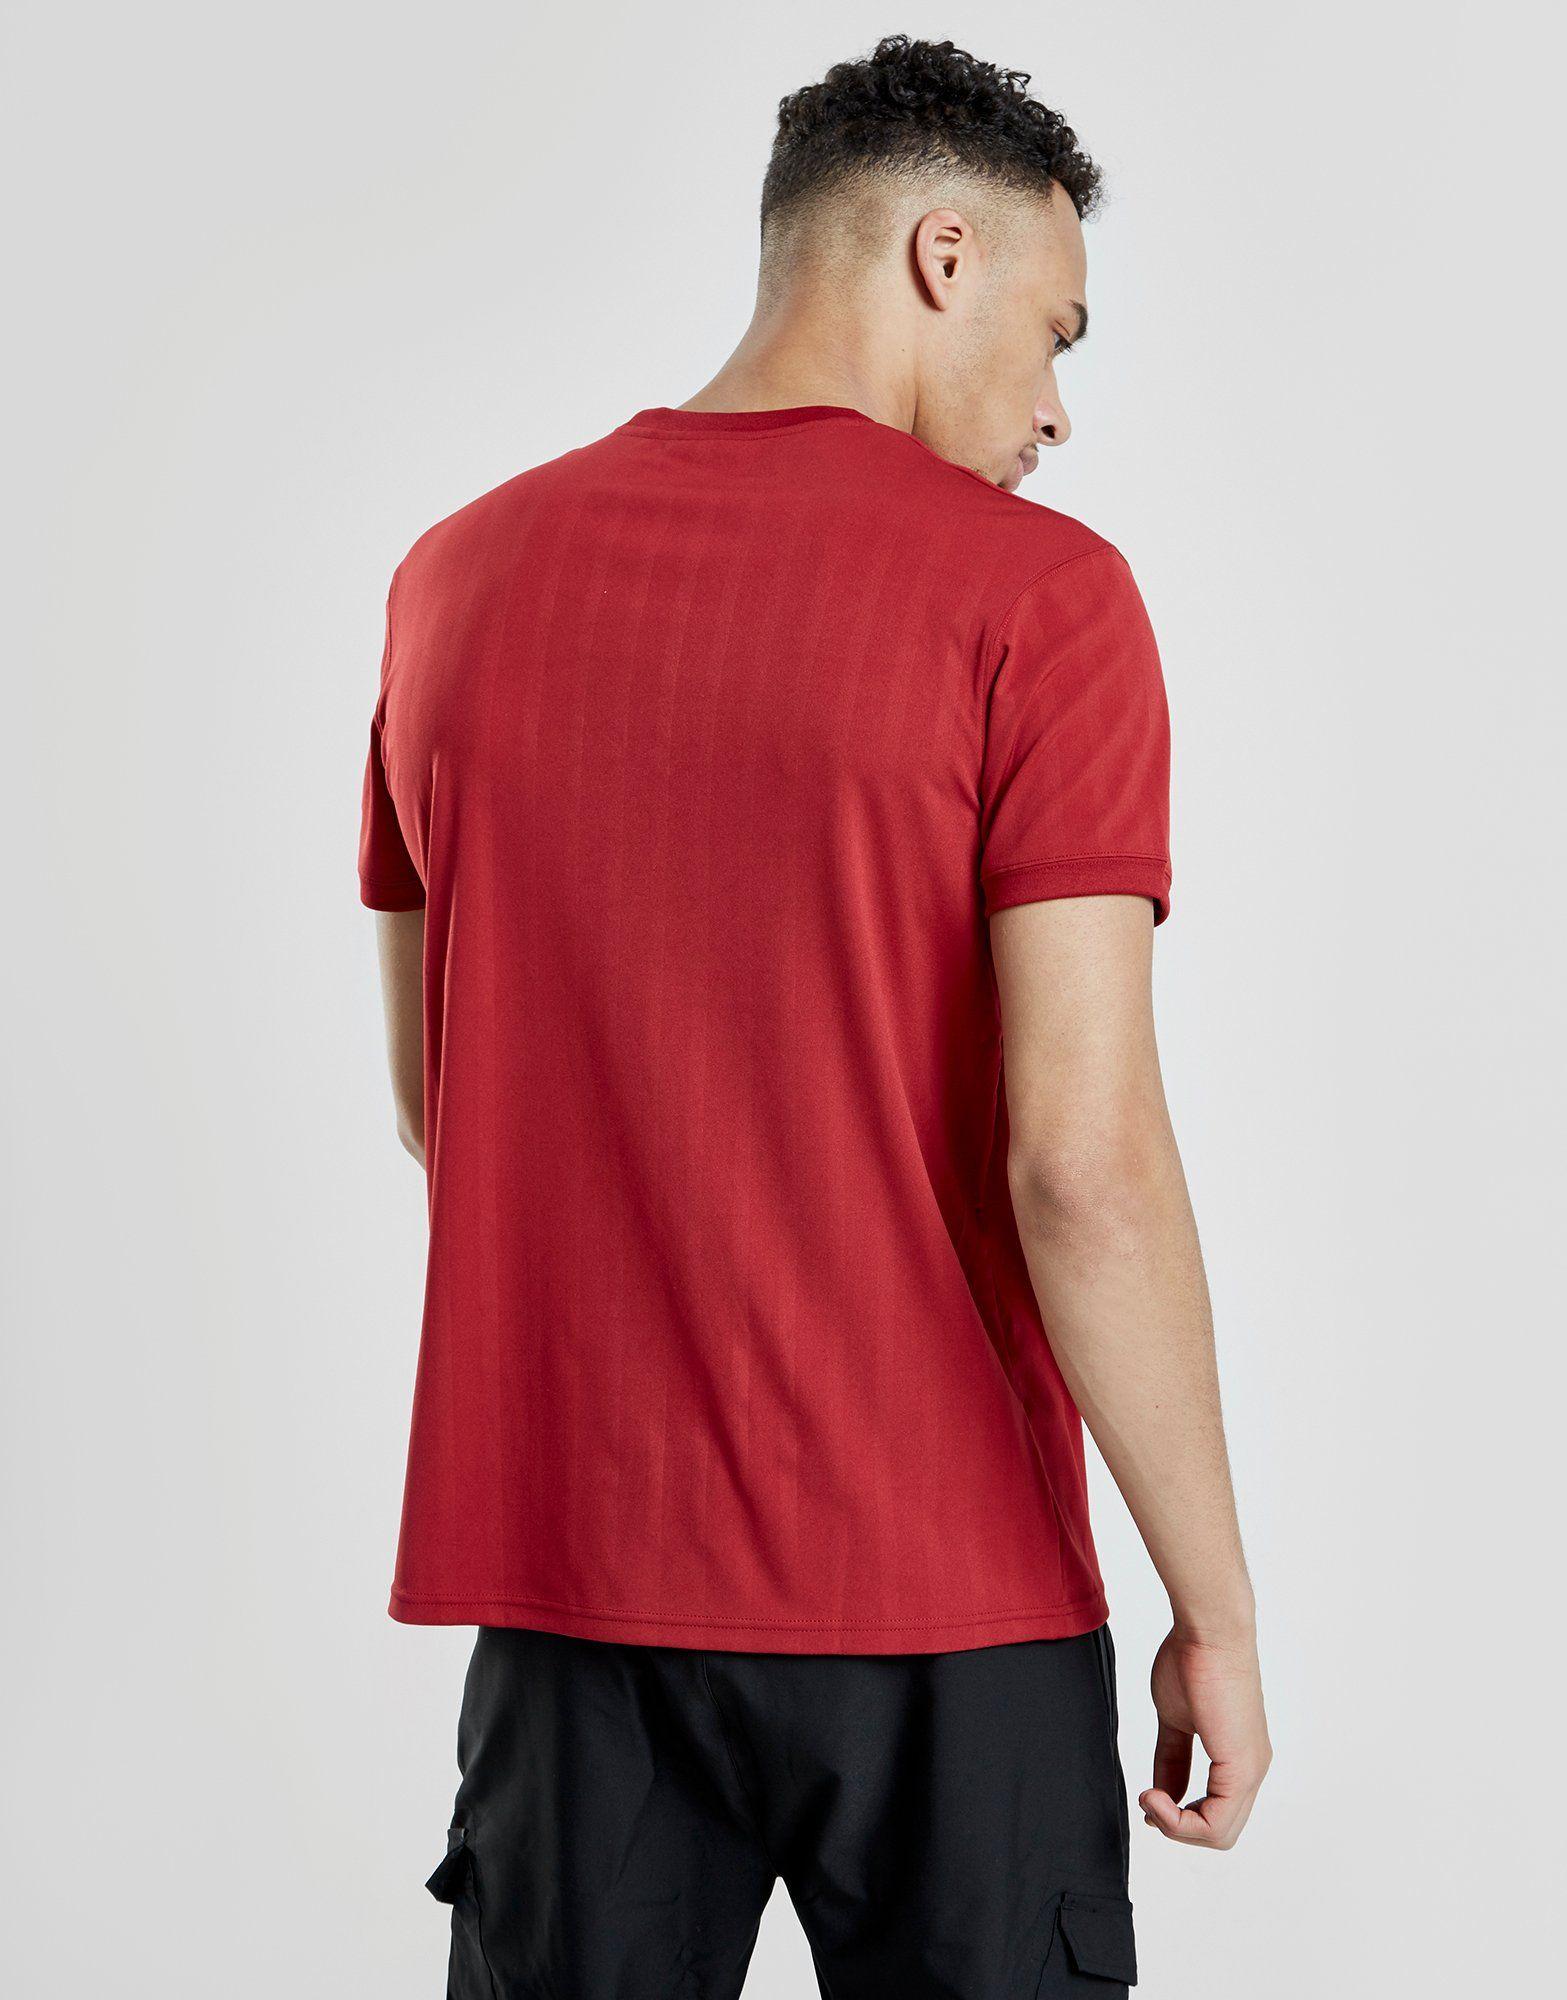 McKenzie Mike T-Shirt